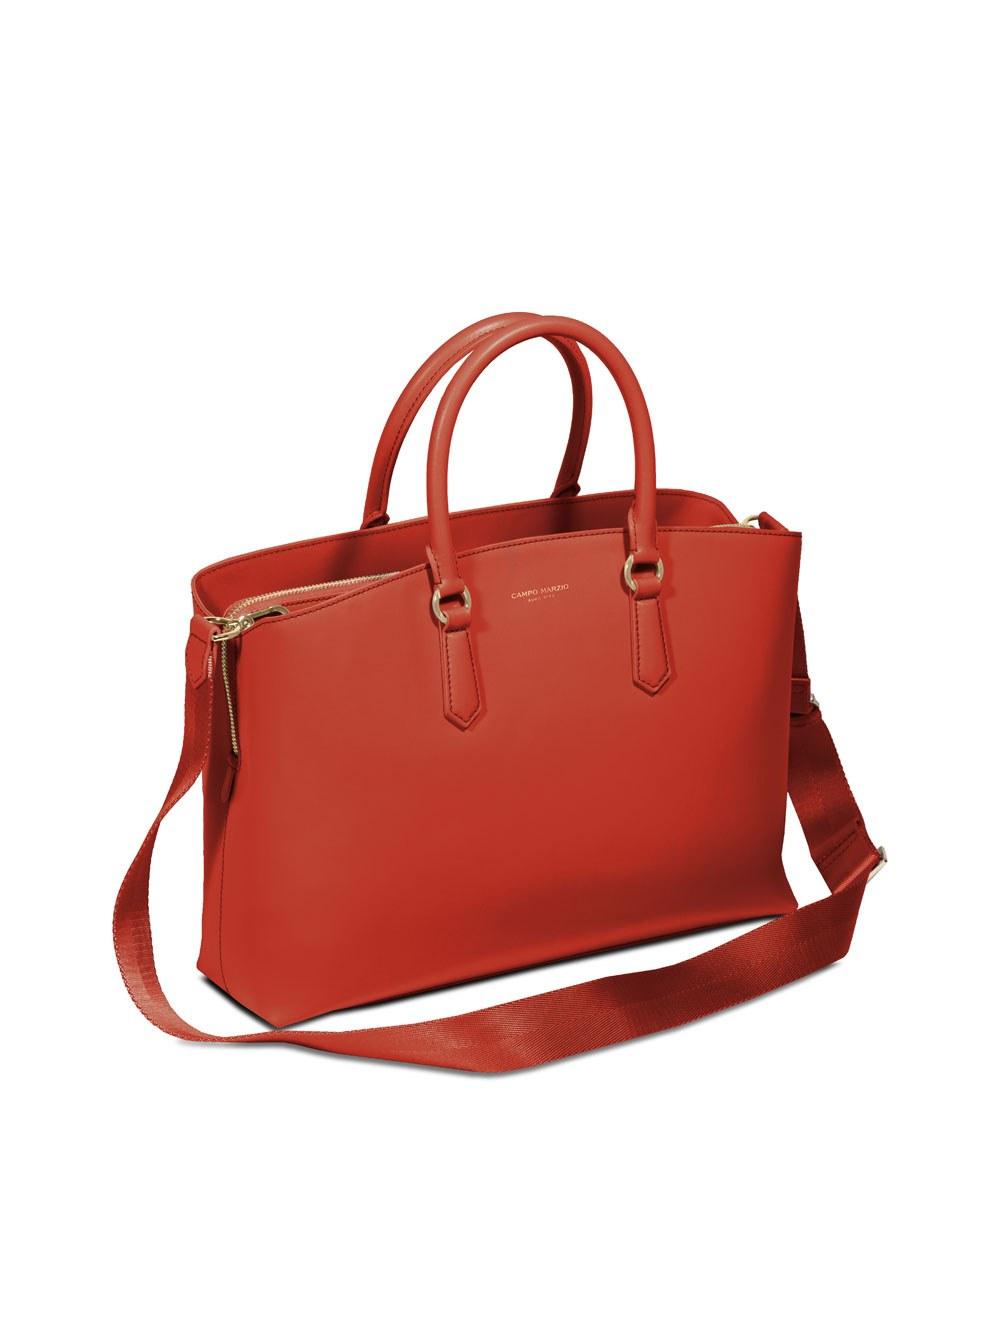 Professional Bag Double Handle - Tangerine Tango